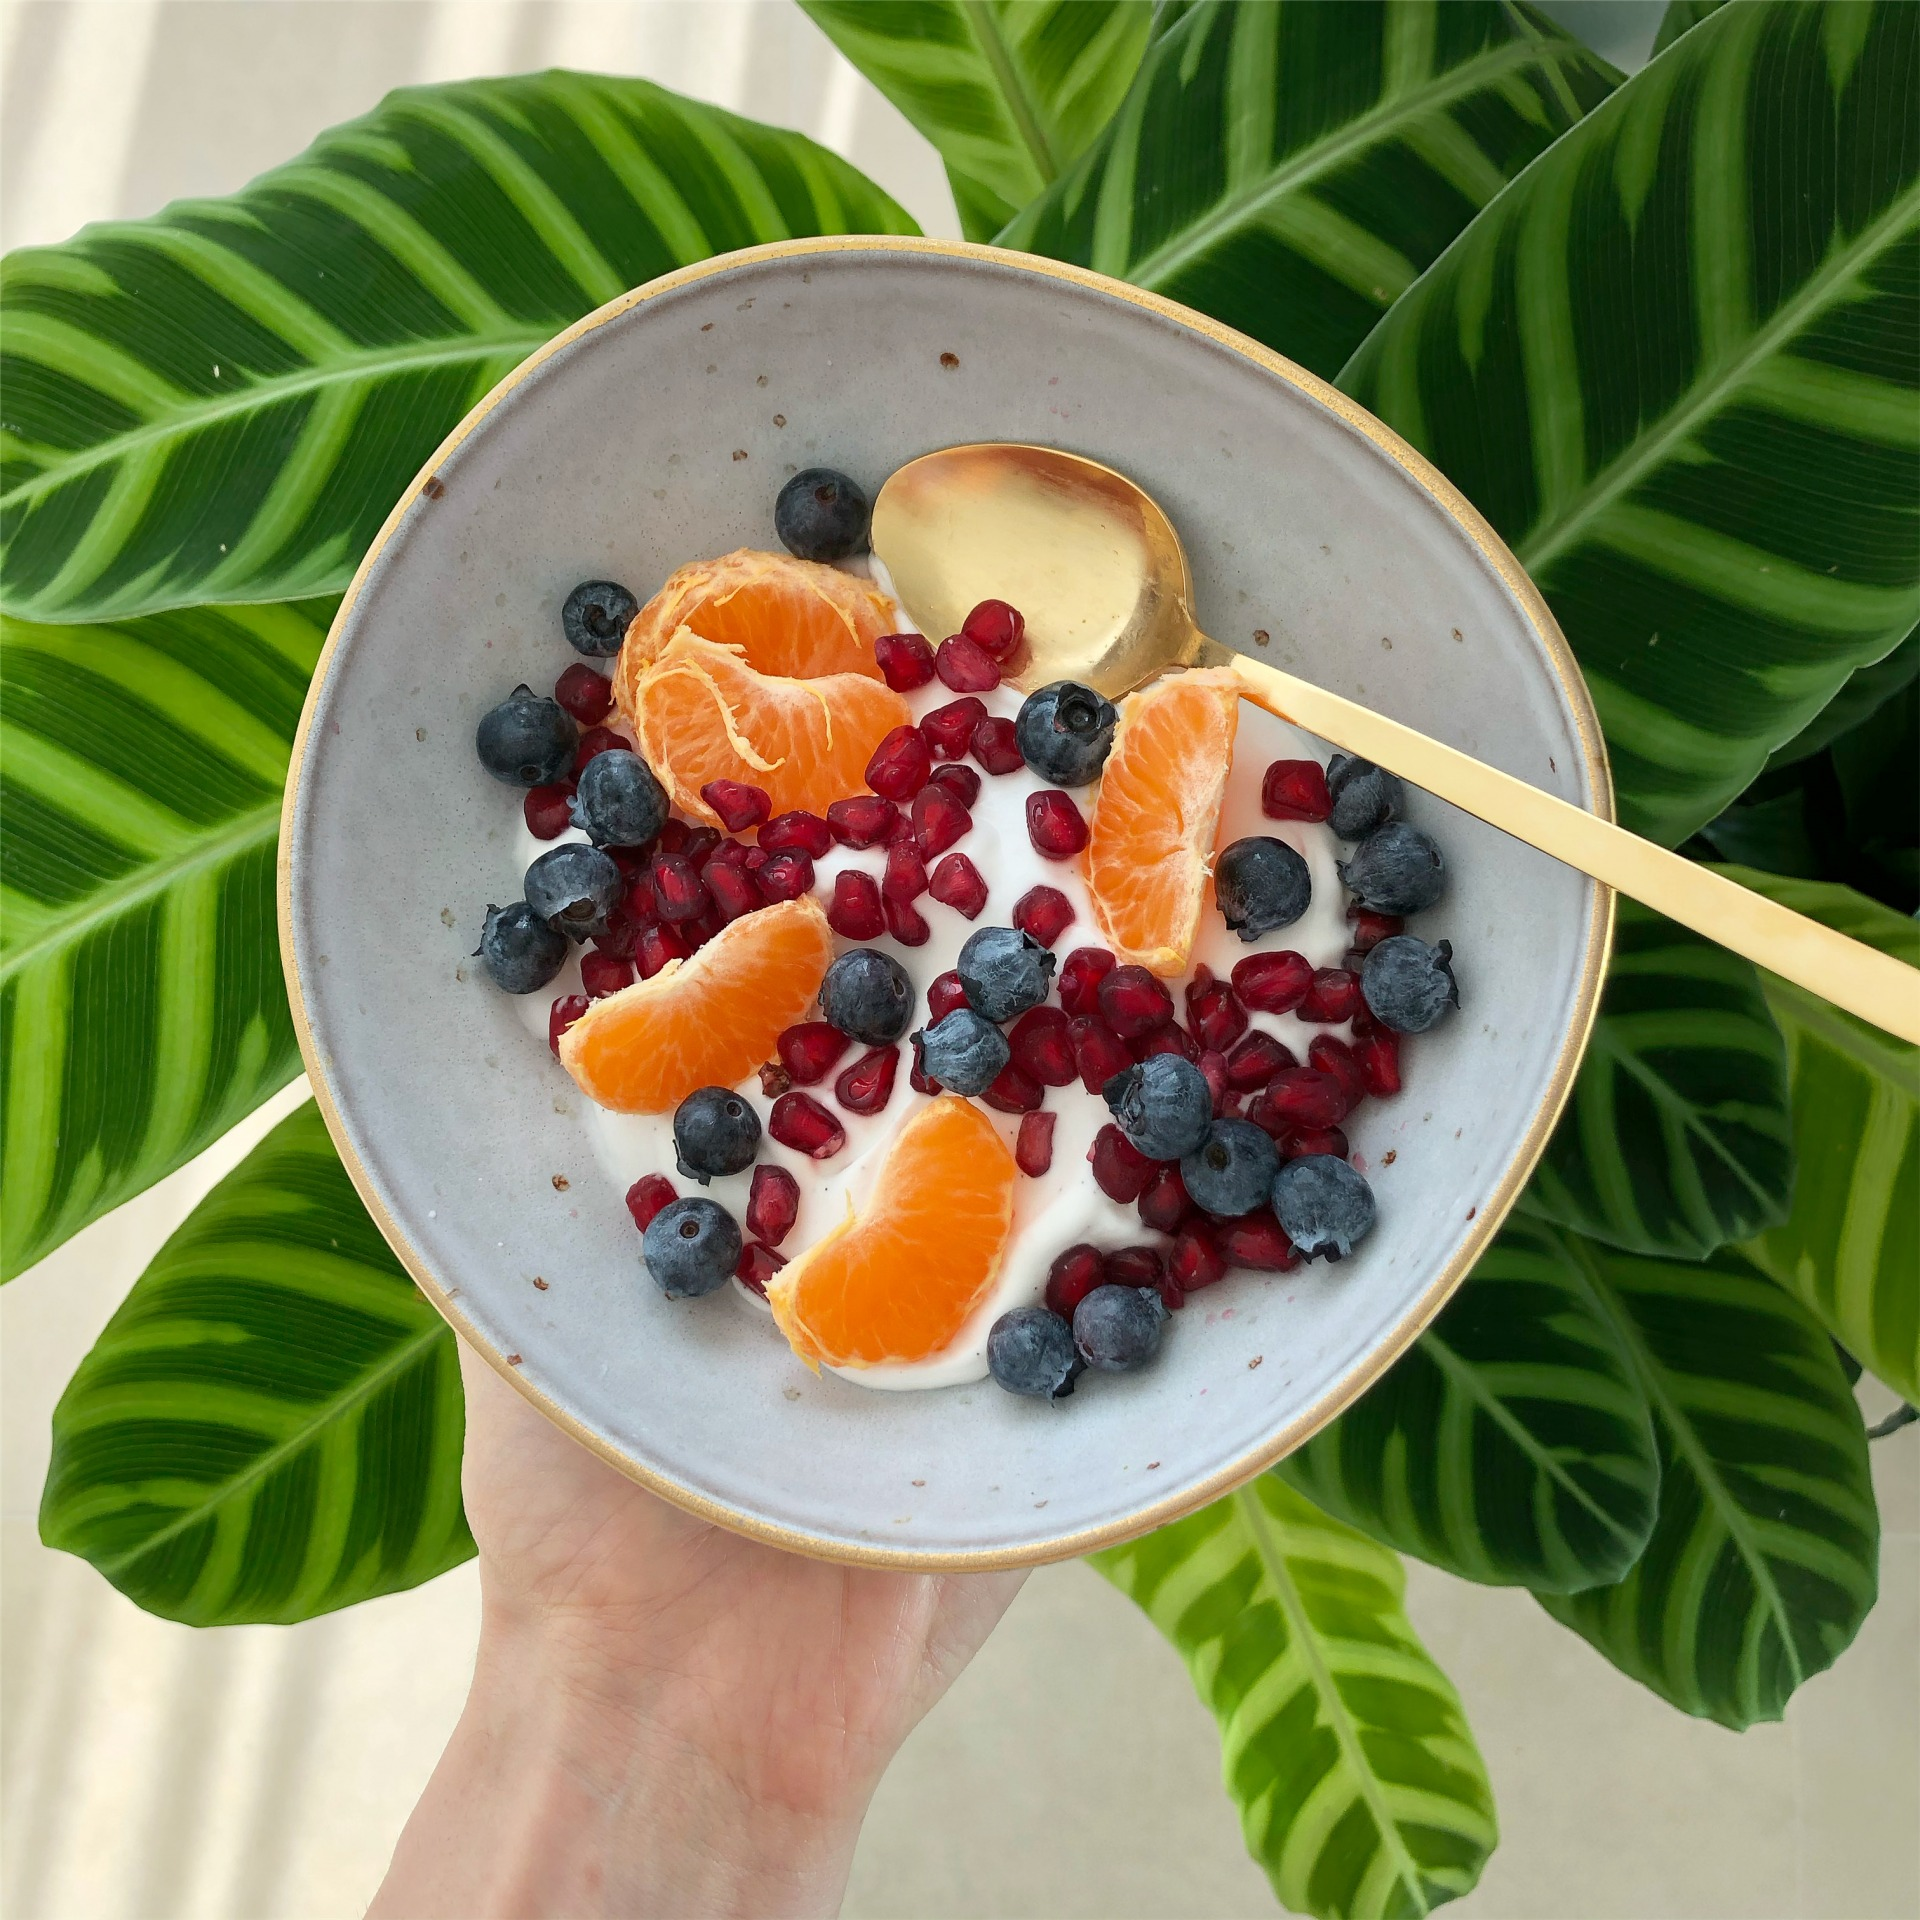 Nutritionist-Approved Healthy Snacks -Yogurt